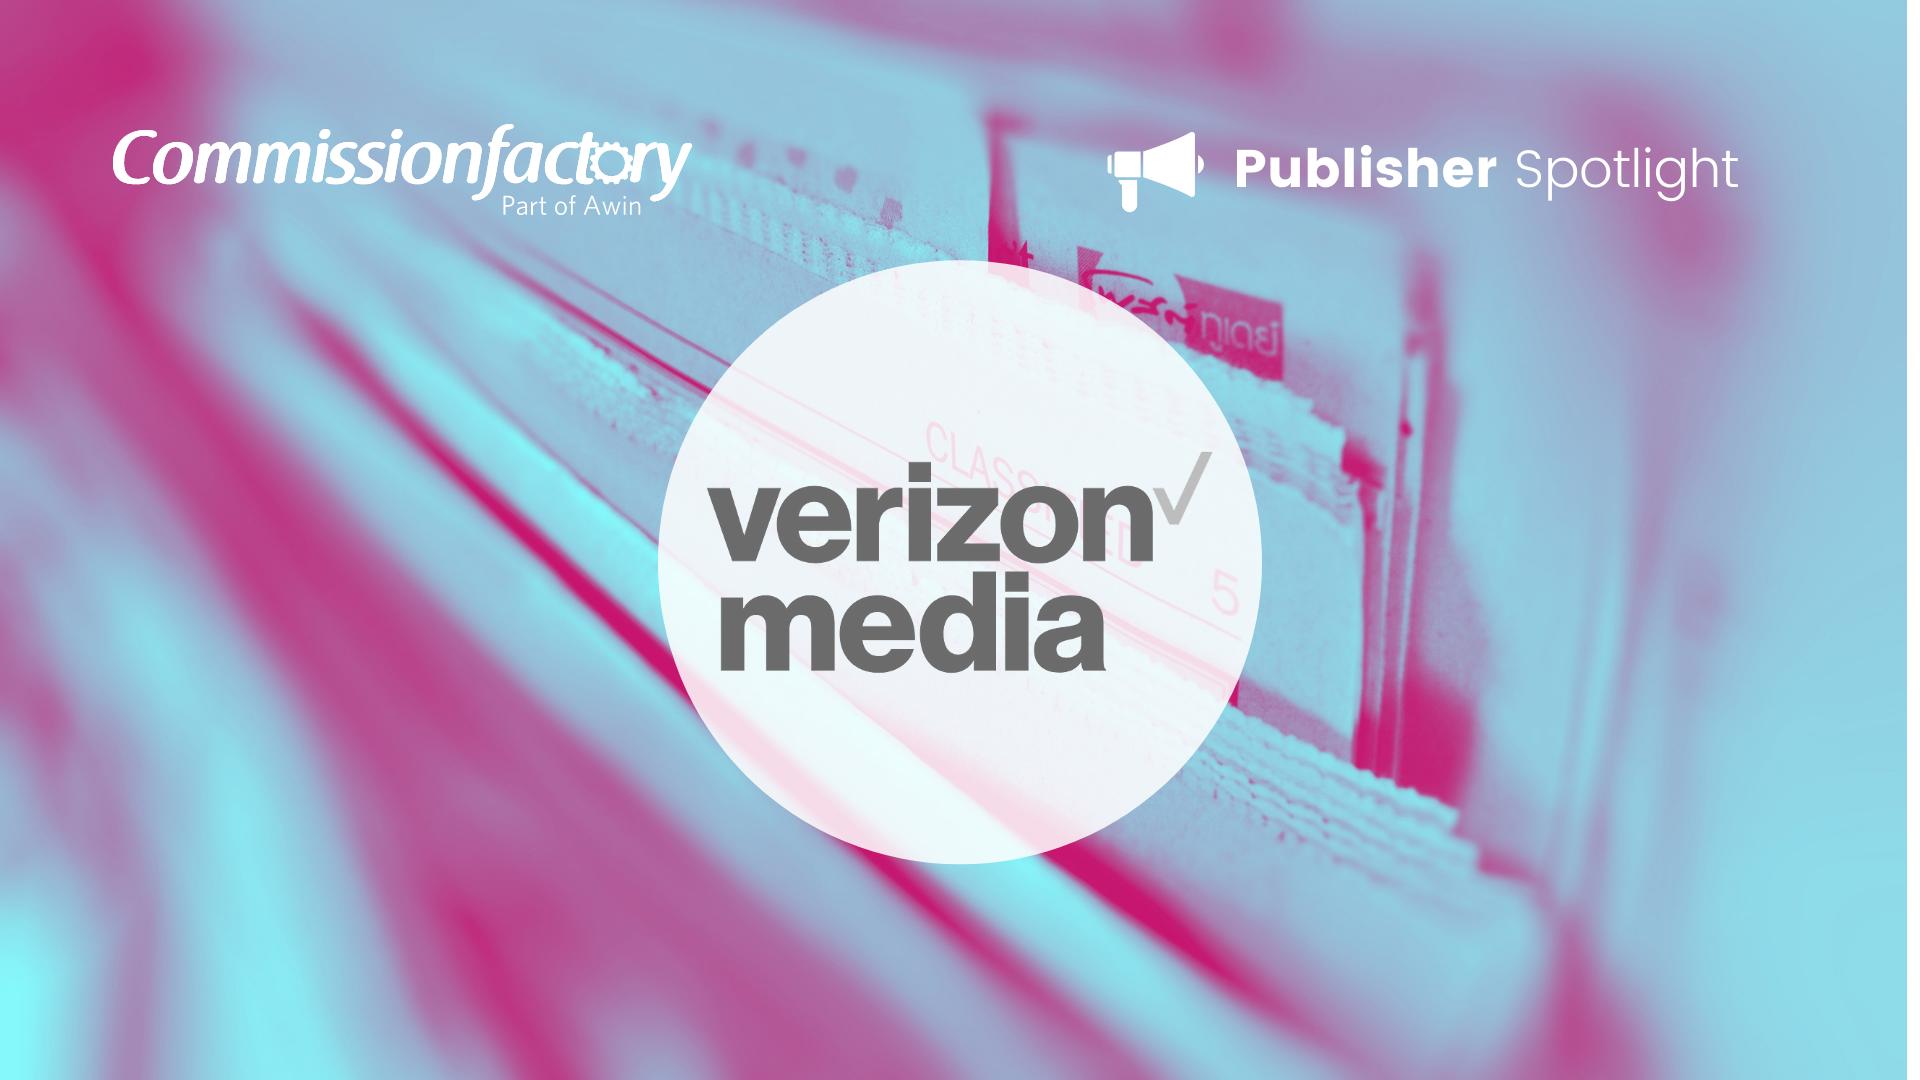 Yahoo Verizon Publisher Spotlight